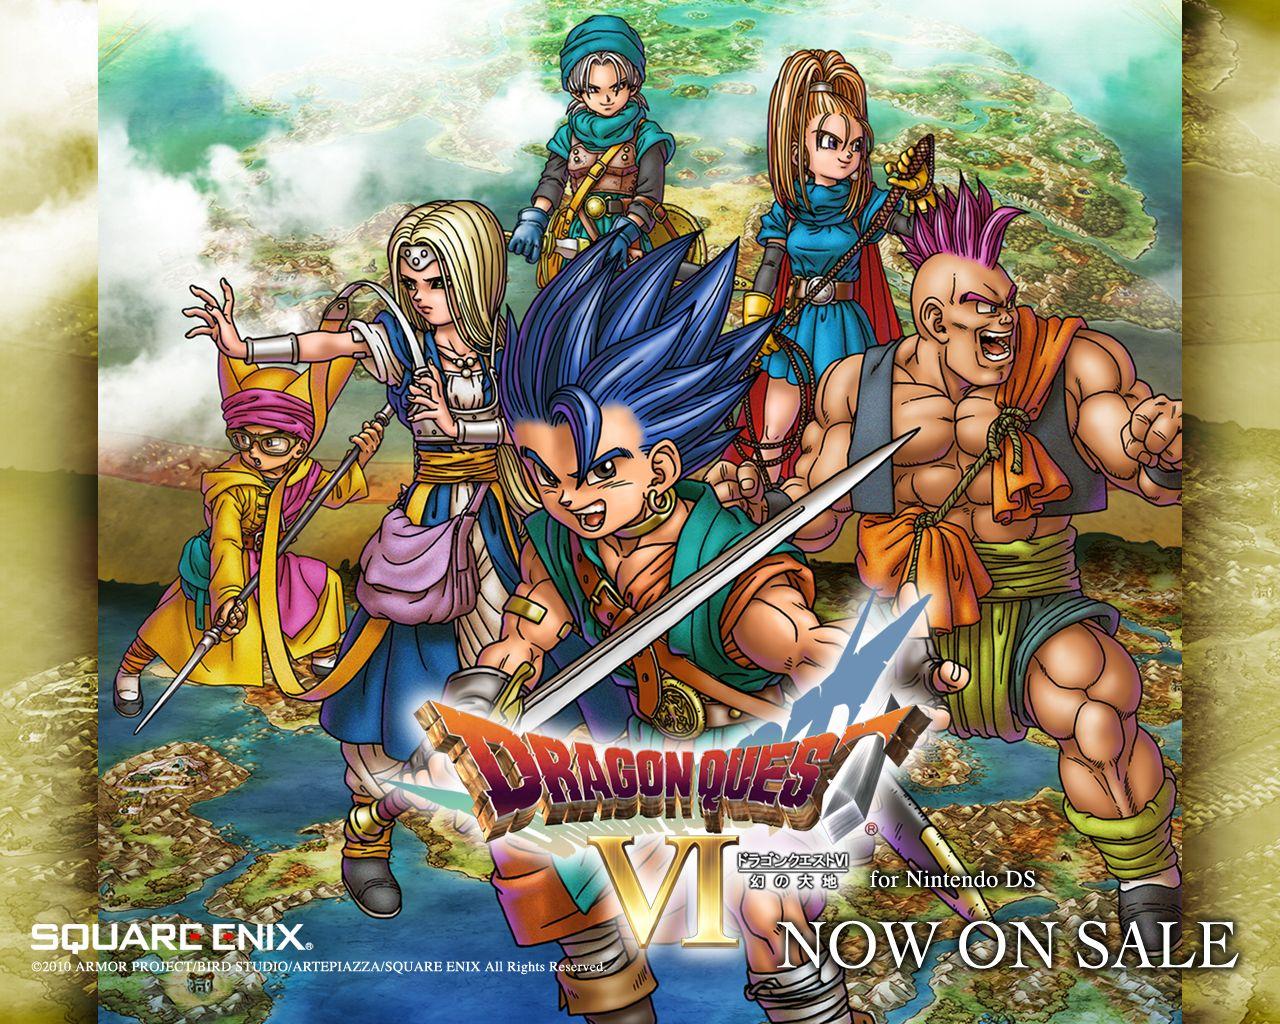 dragonquest_vi_03_1280